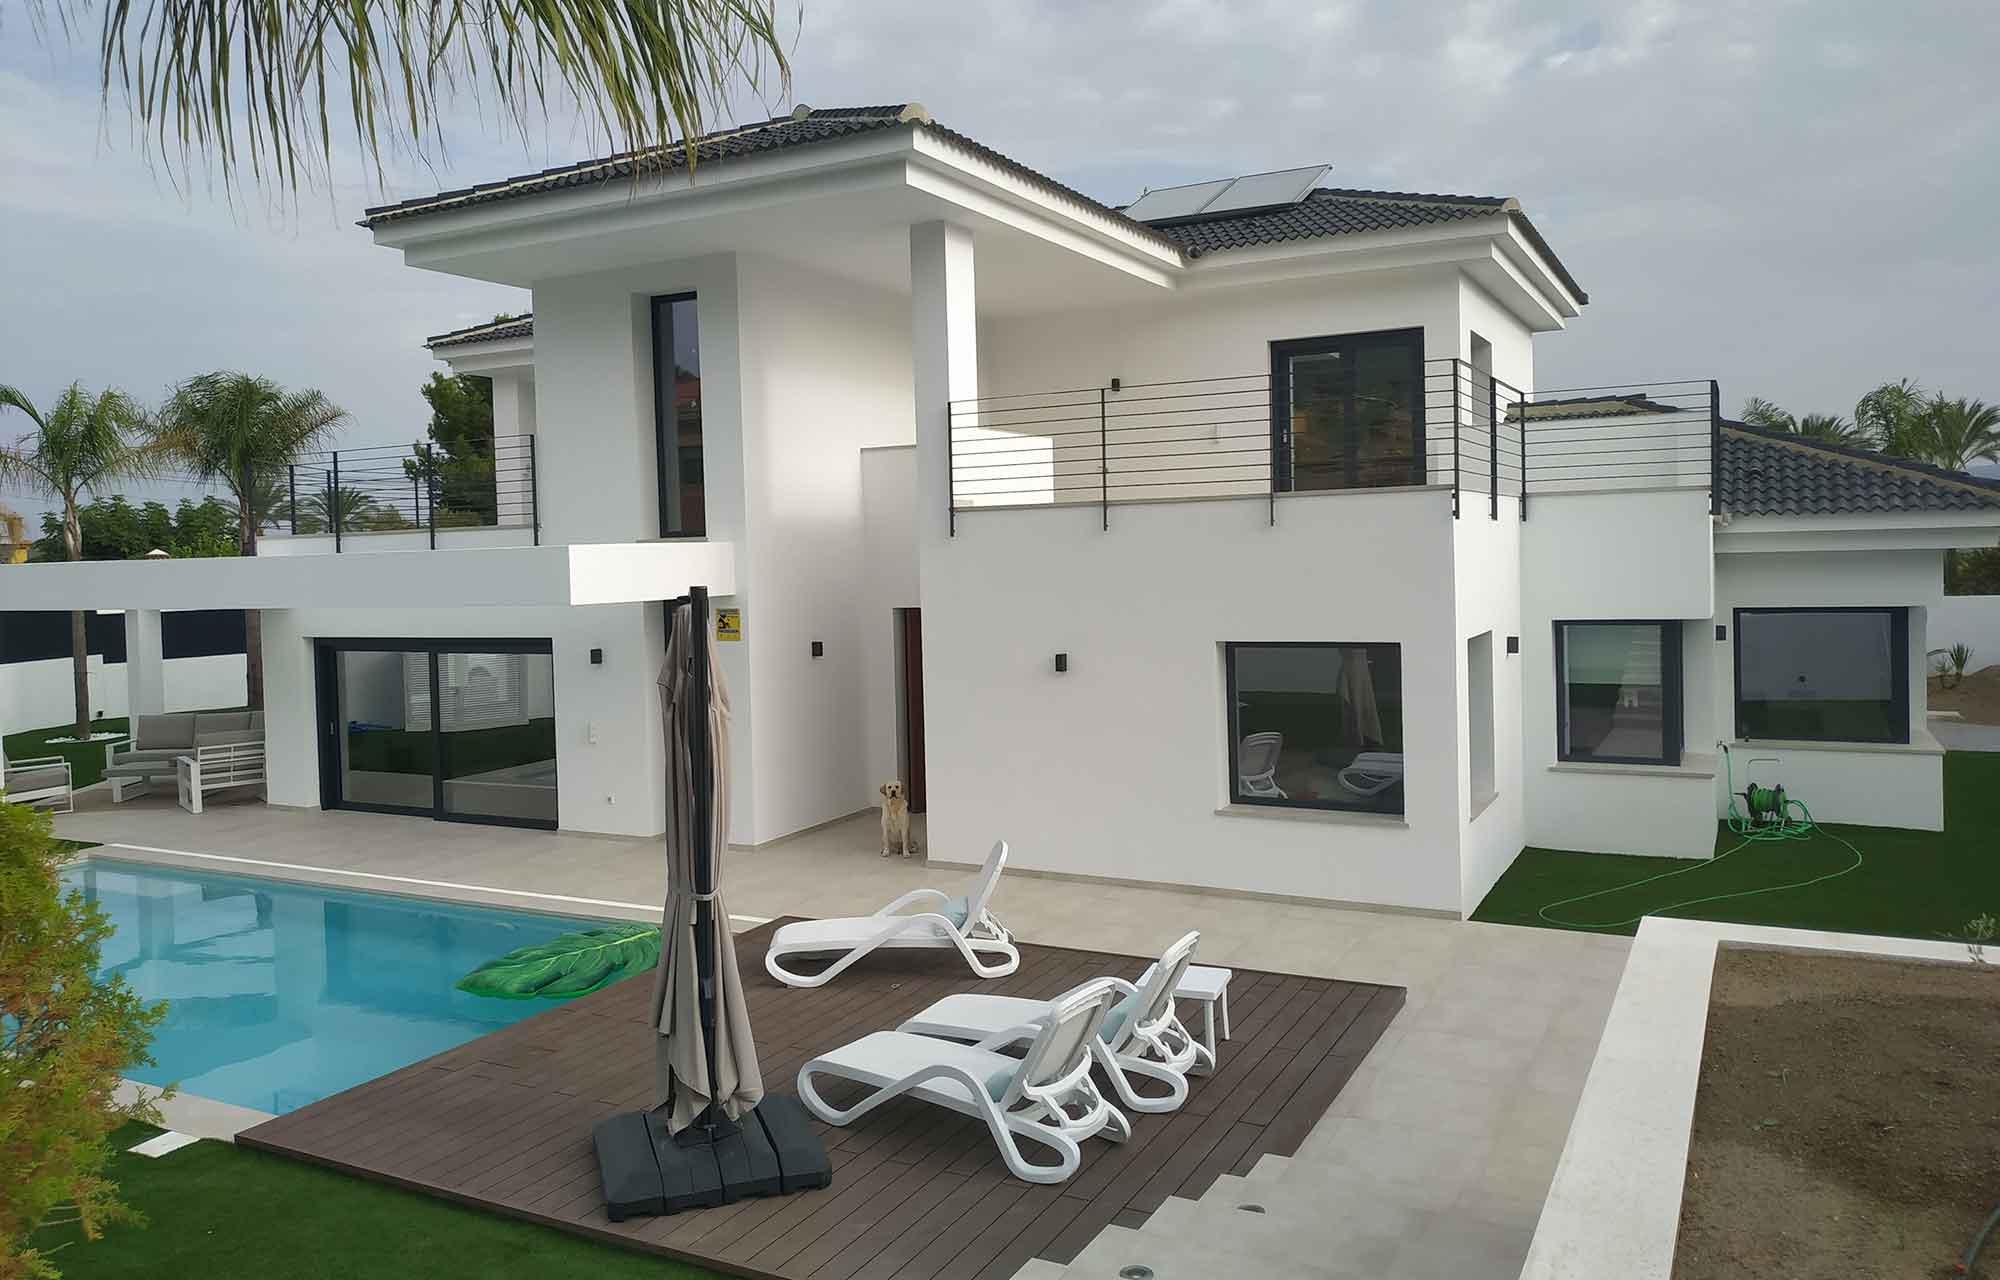 arquitectos viviendas promotora malaga